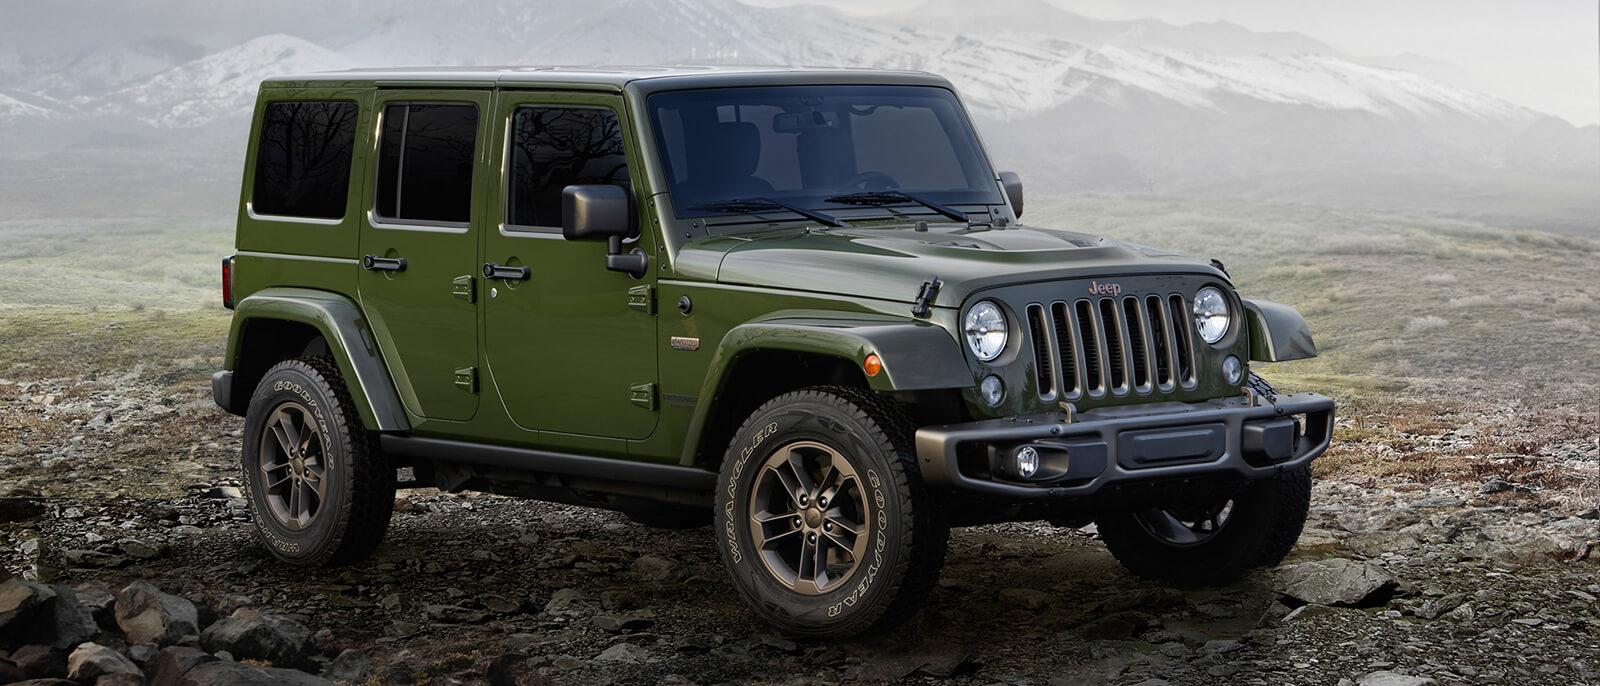 2016 Jeep Wrangler green